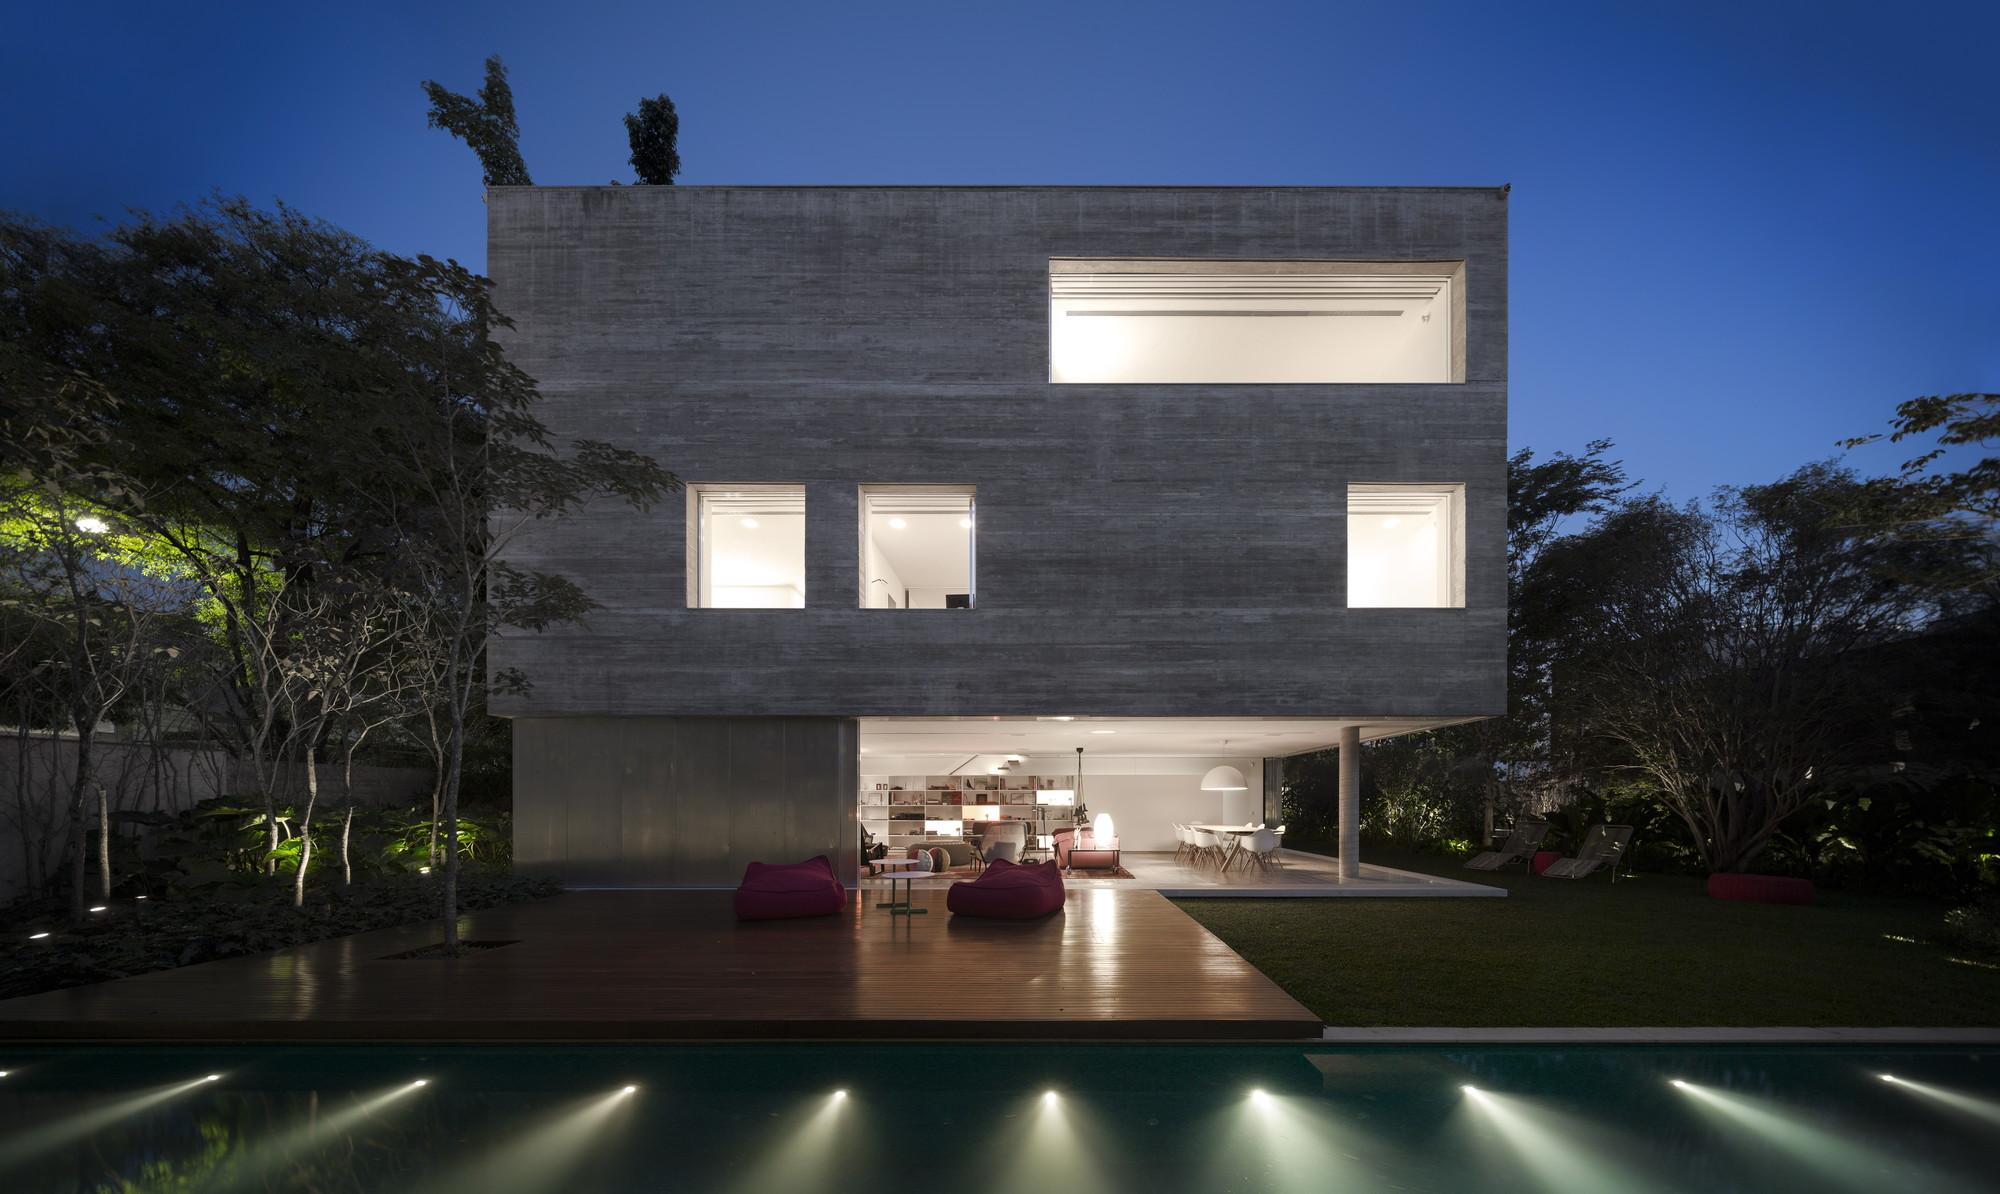 Cube House / Studio MK27 - Marcio Kogan + Suzana Glogowski, © FG+SG - Fernando Guerra